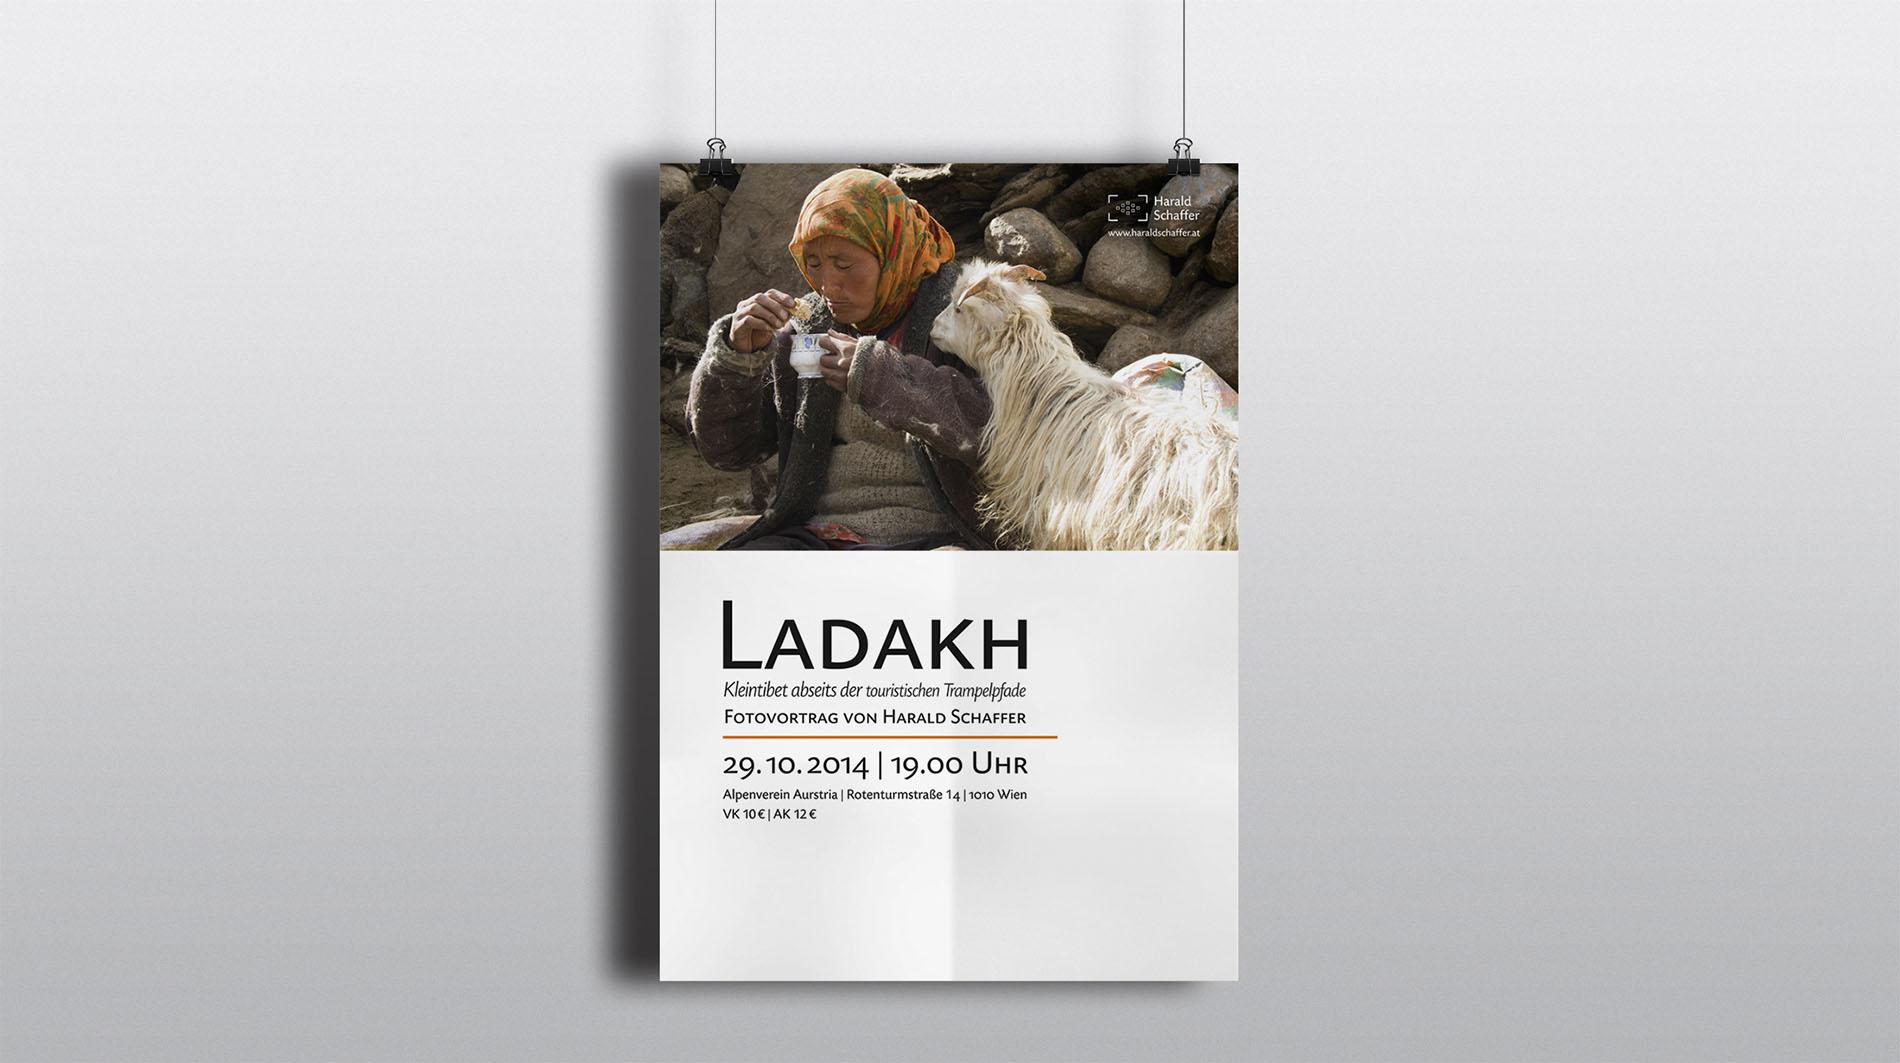 CD Harald Schaffer | Vortragsplakat Ladakh